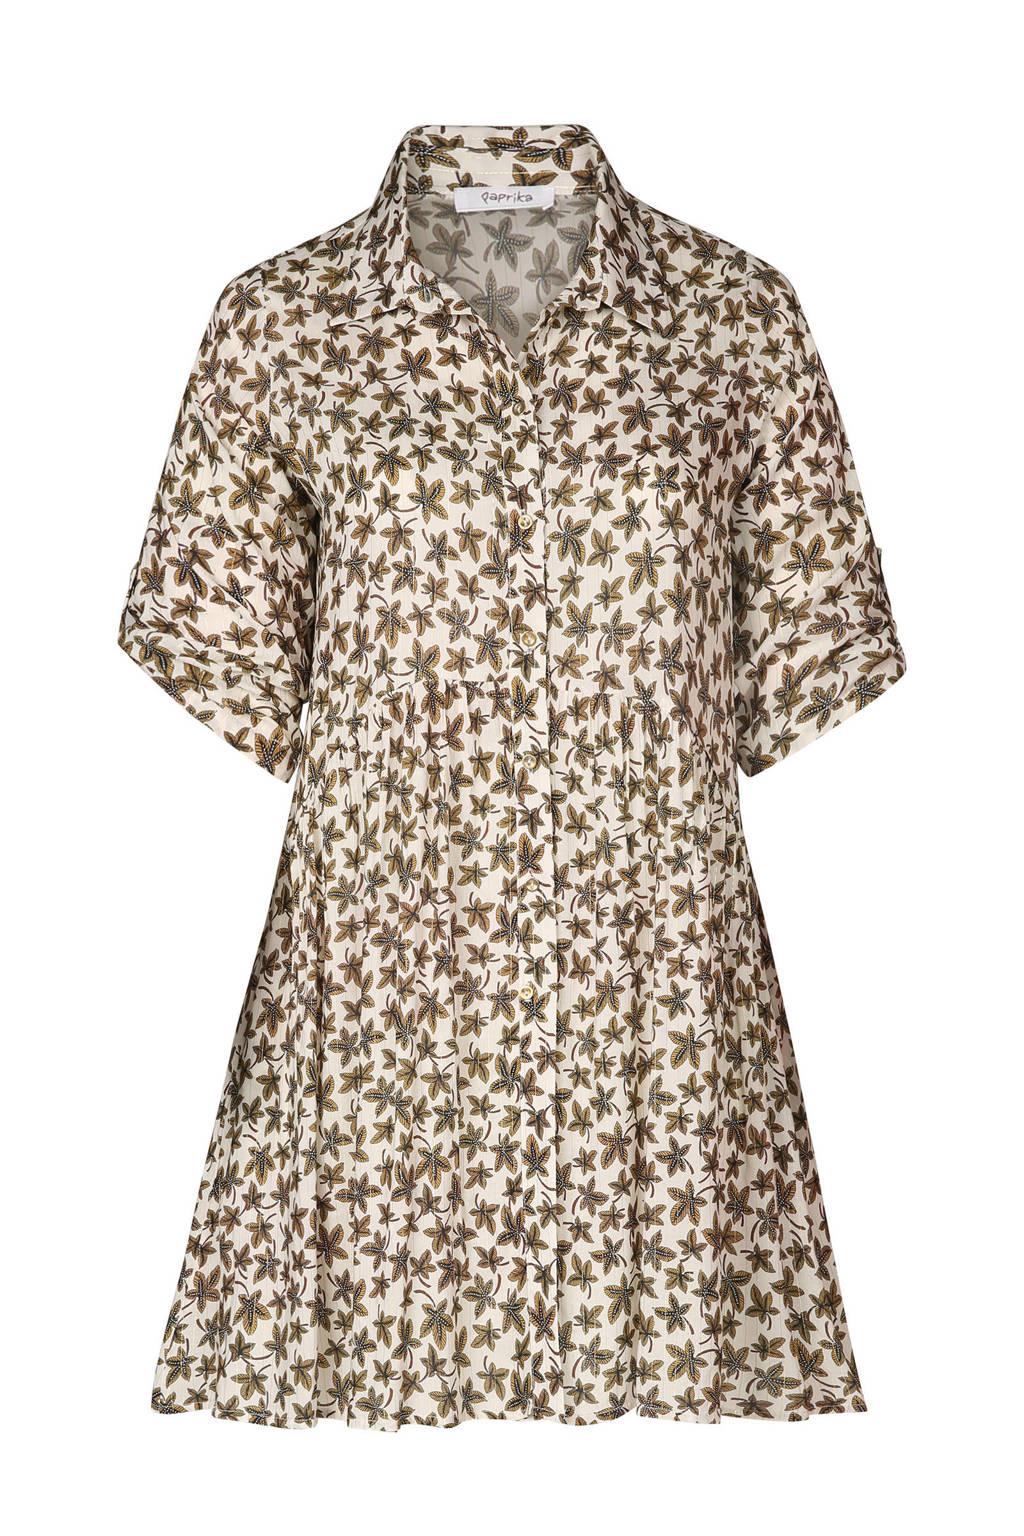 Paprika blousejurk met alover bladprint en lurex, Ecru